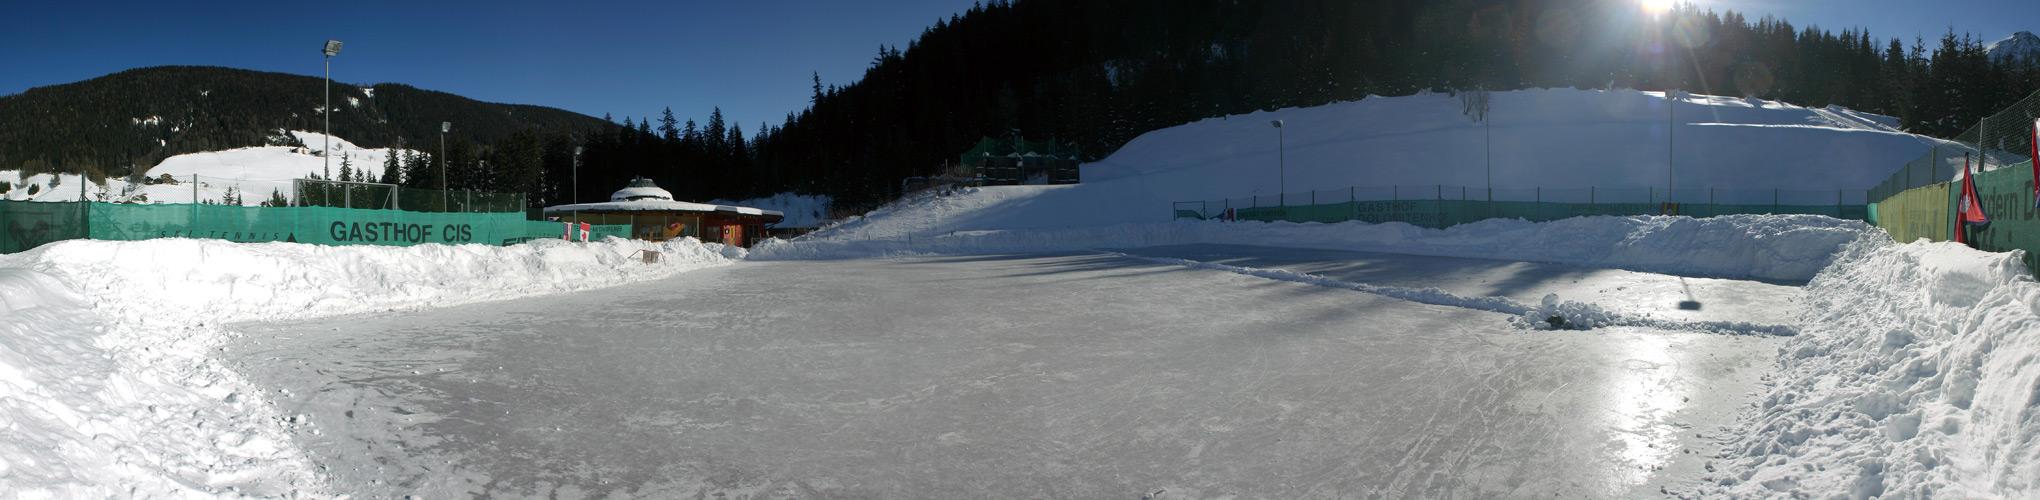 Eislaufplatz